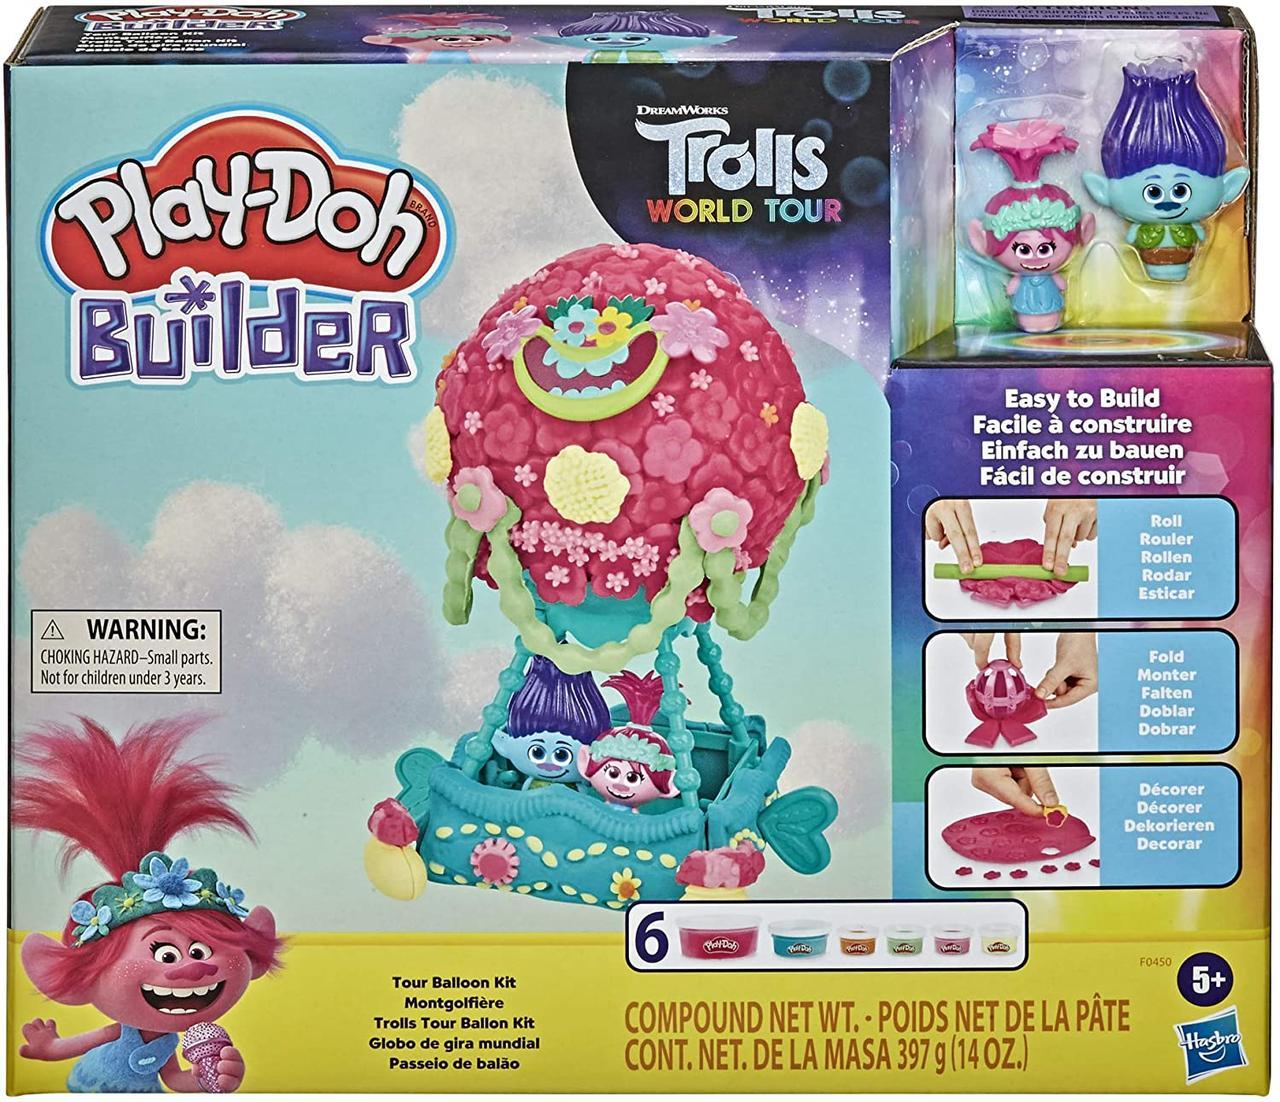 Набор для творчества Плей-До Буквы и языки Play-Doh Shape and Learn Letters and Language